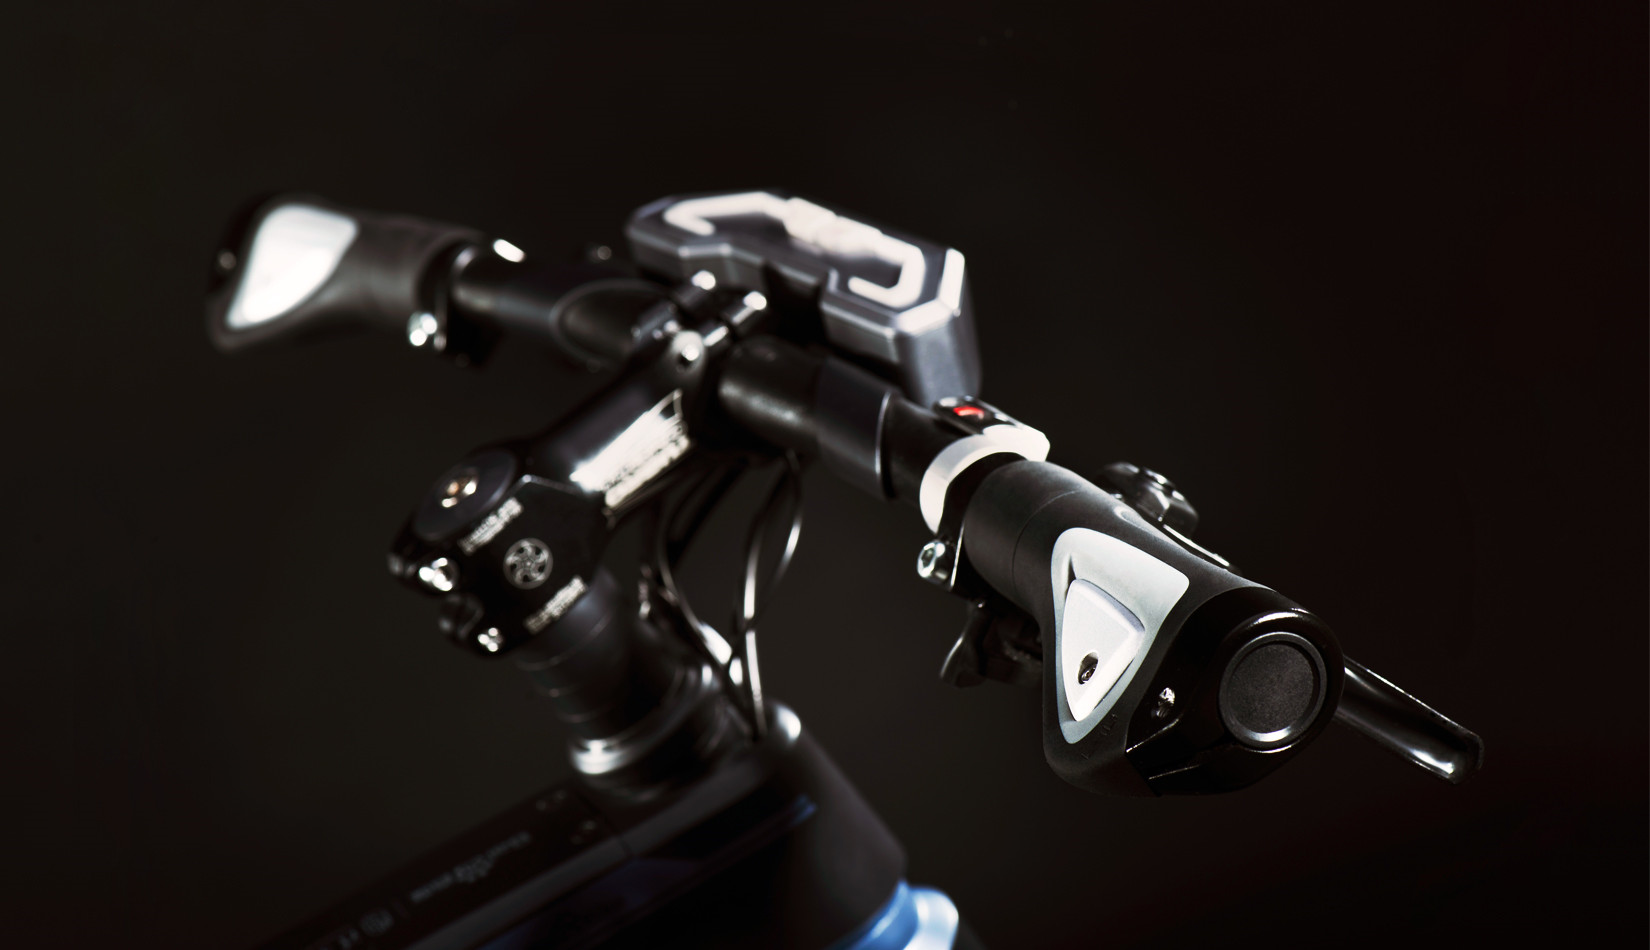 Smart Bike Project de Baidu, le vélo intelligent